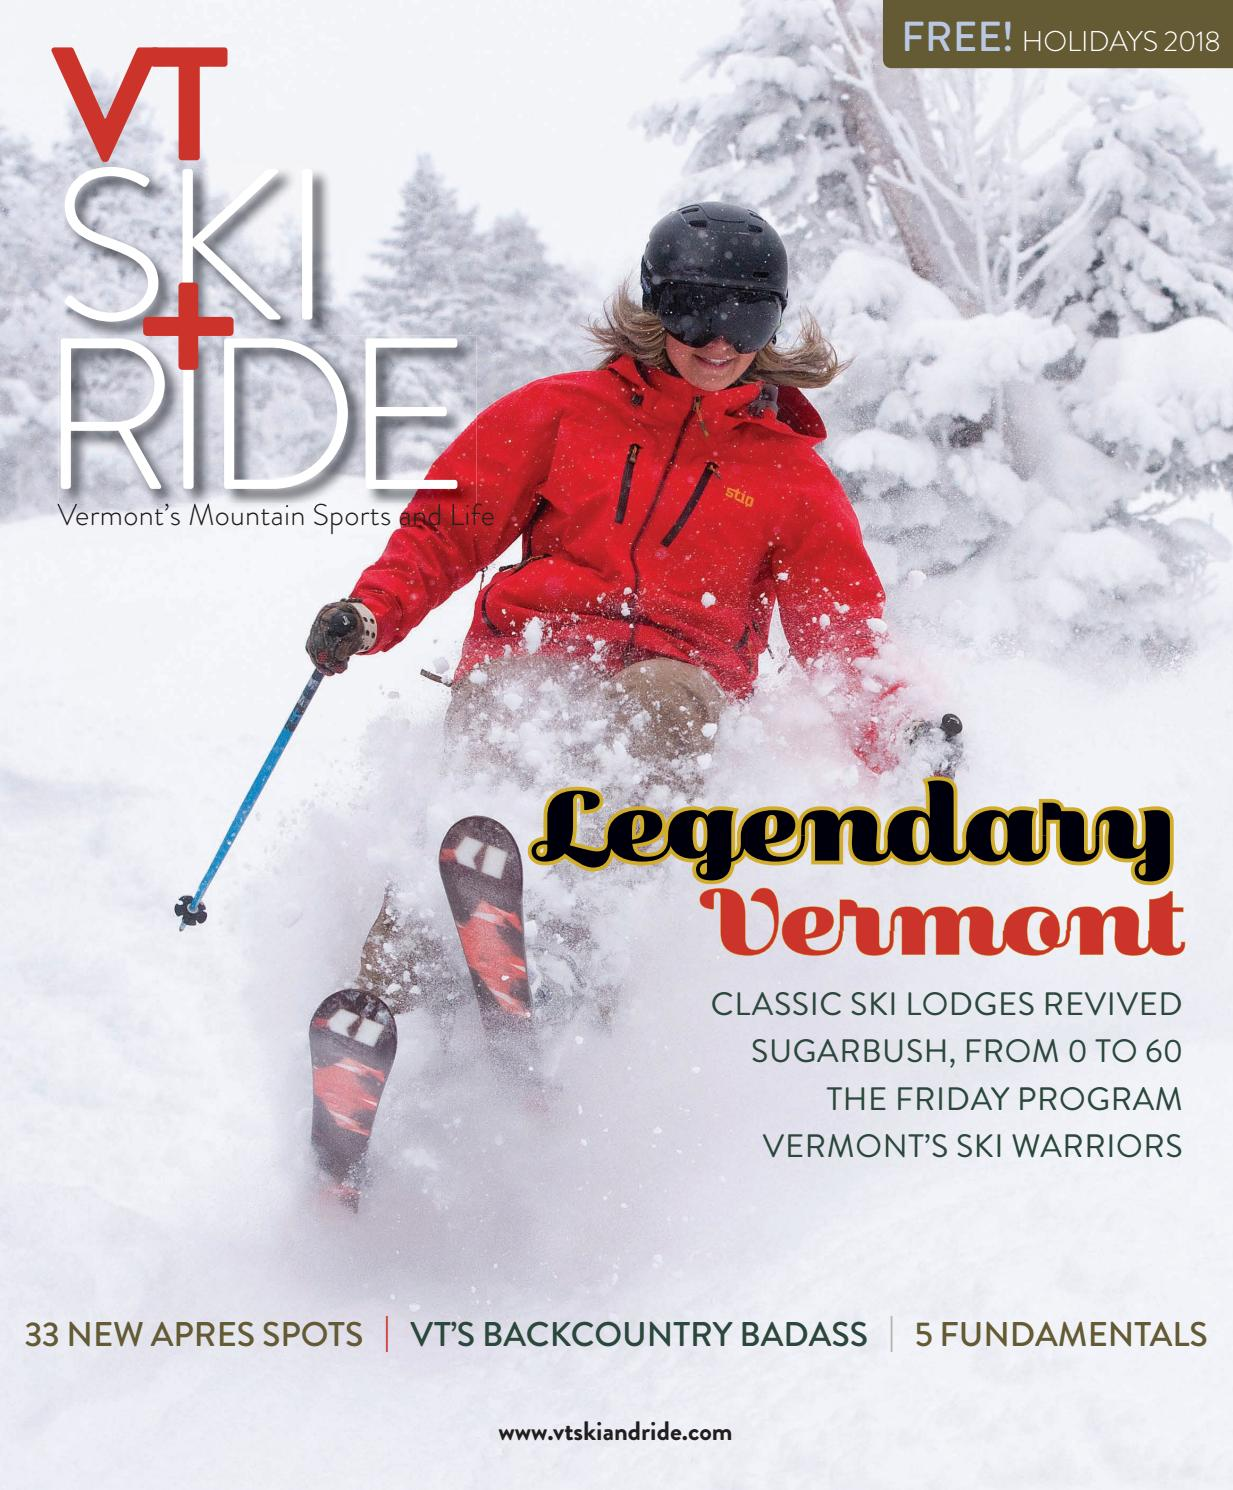 Vermont Ski and Ride Holidays, 2018 by AddisonPress - issuu